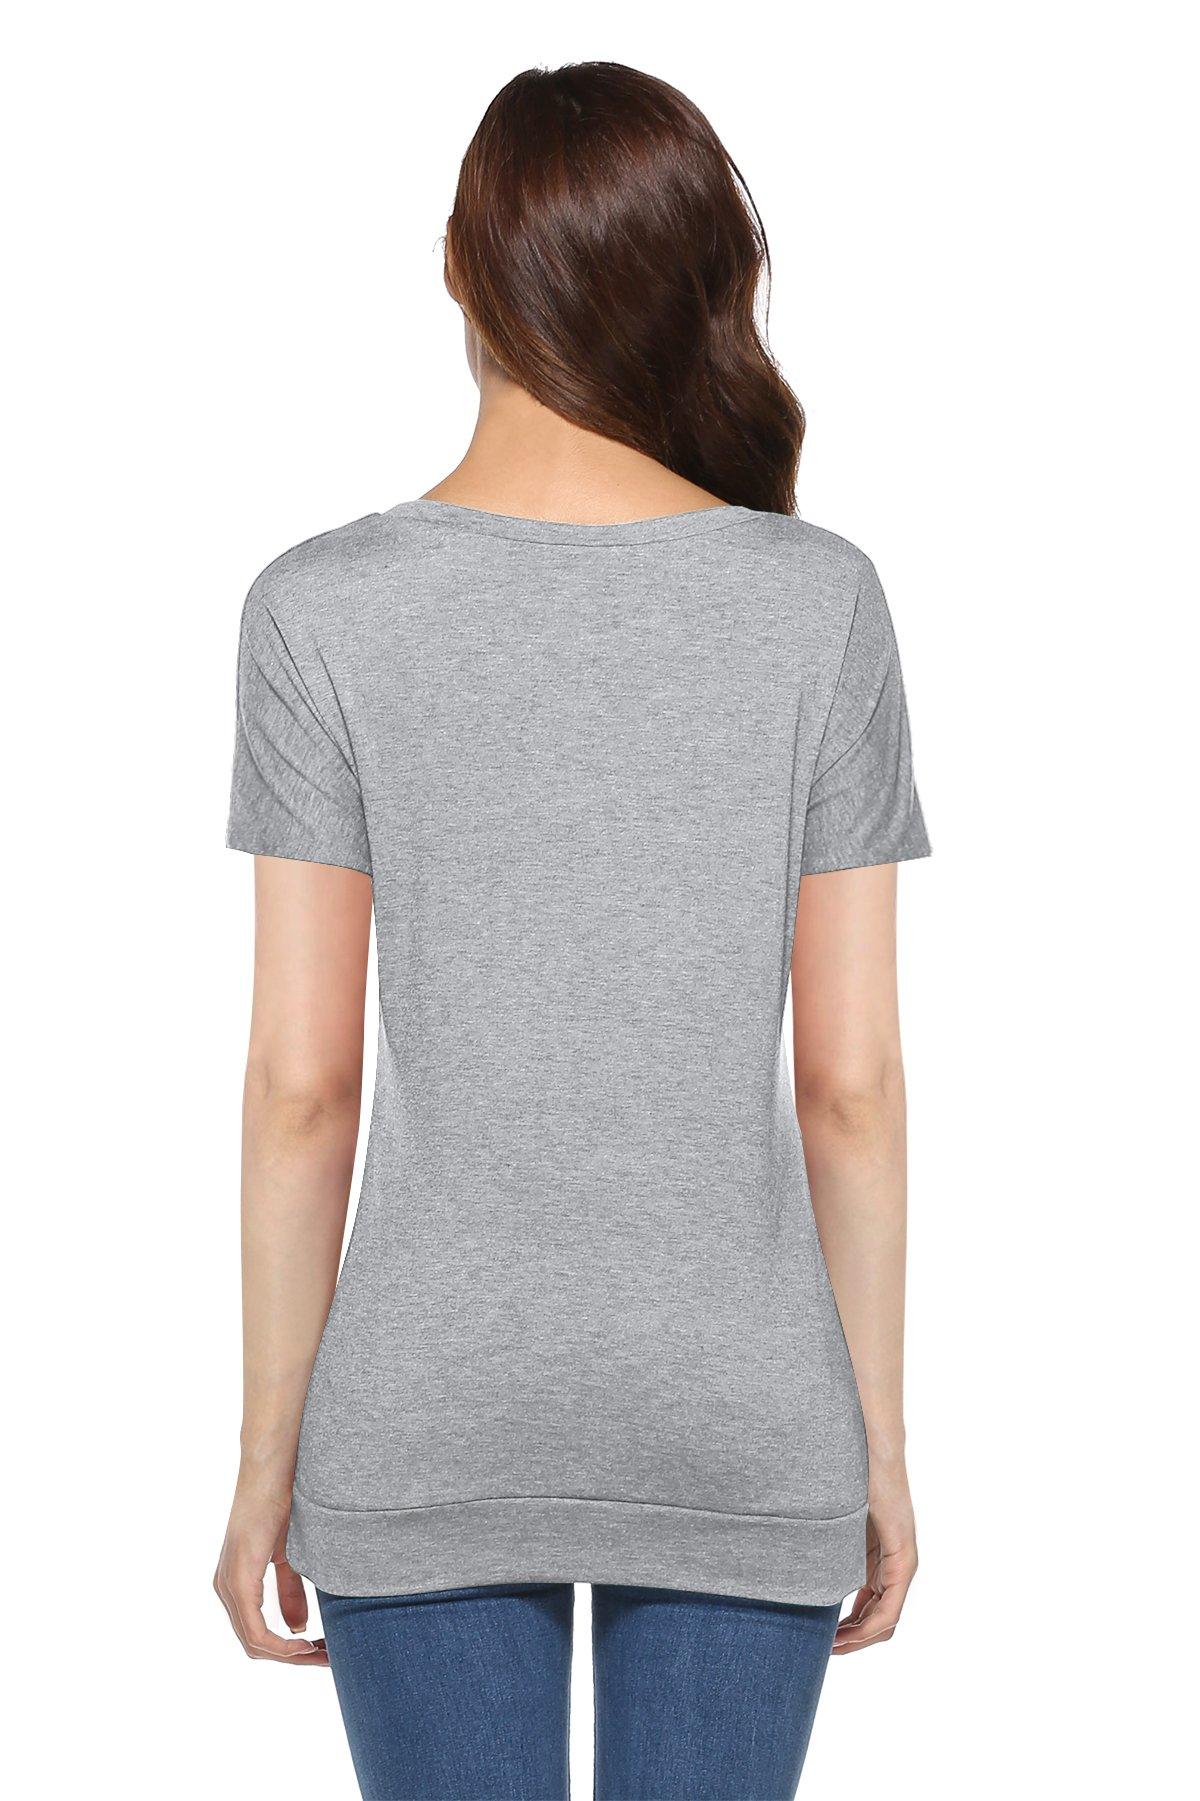 Mujer Camiseta T-Shirt Mini Vestido Verano Encaje Dobladillo Túnica Tops Estival de Manga Corta Casual Ropa Tamaño…